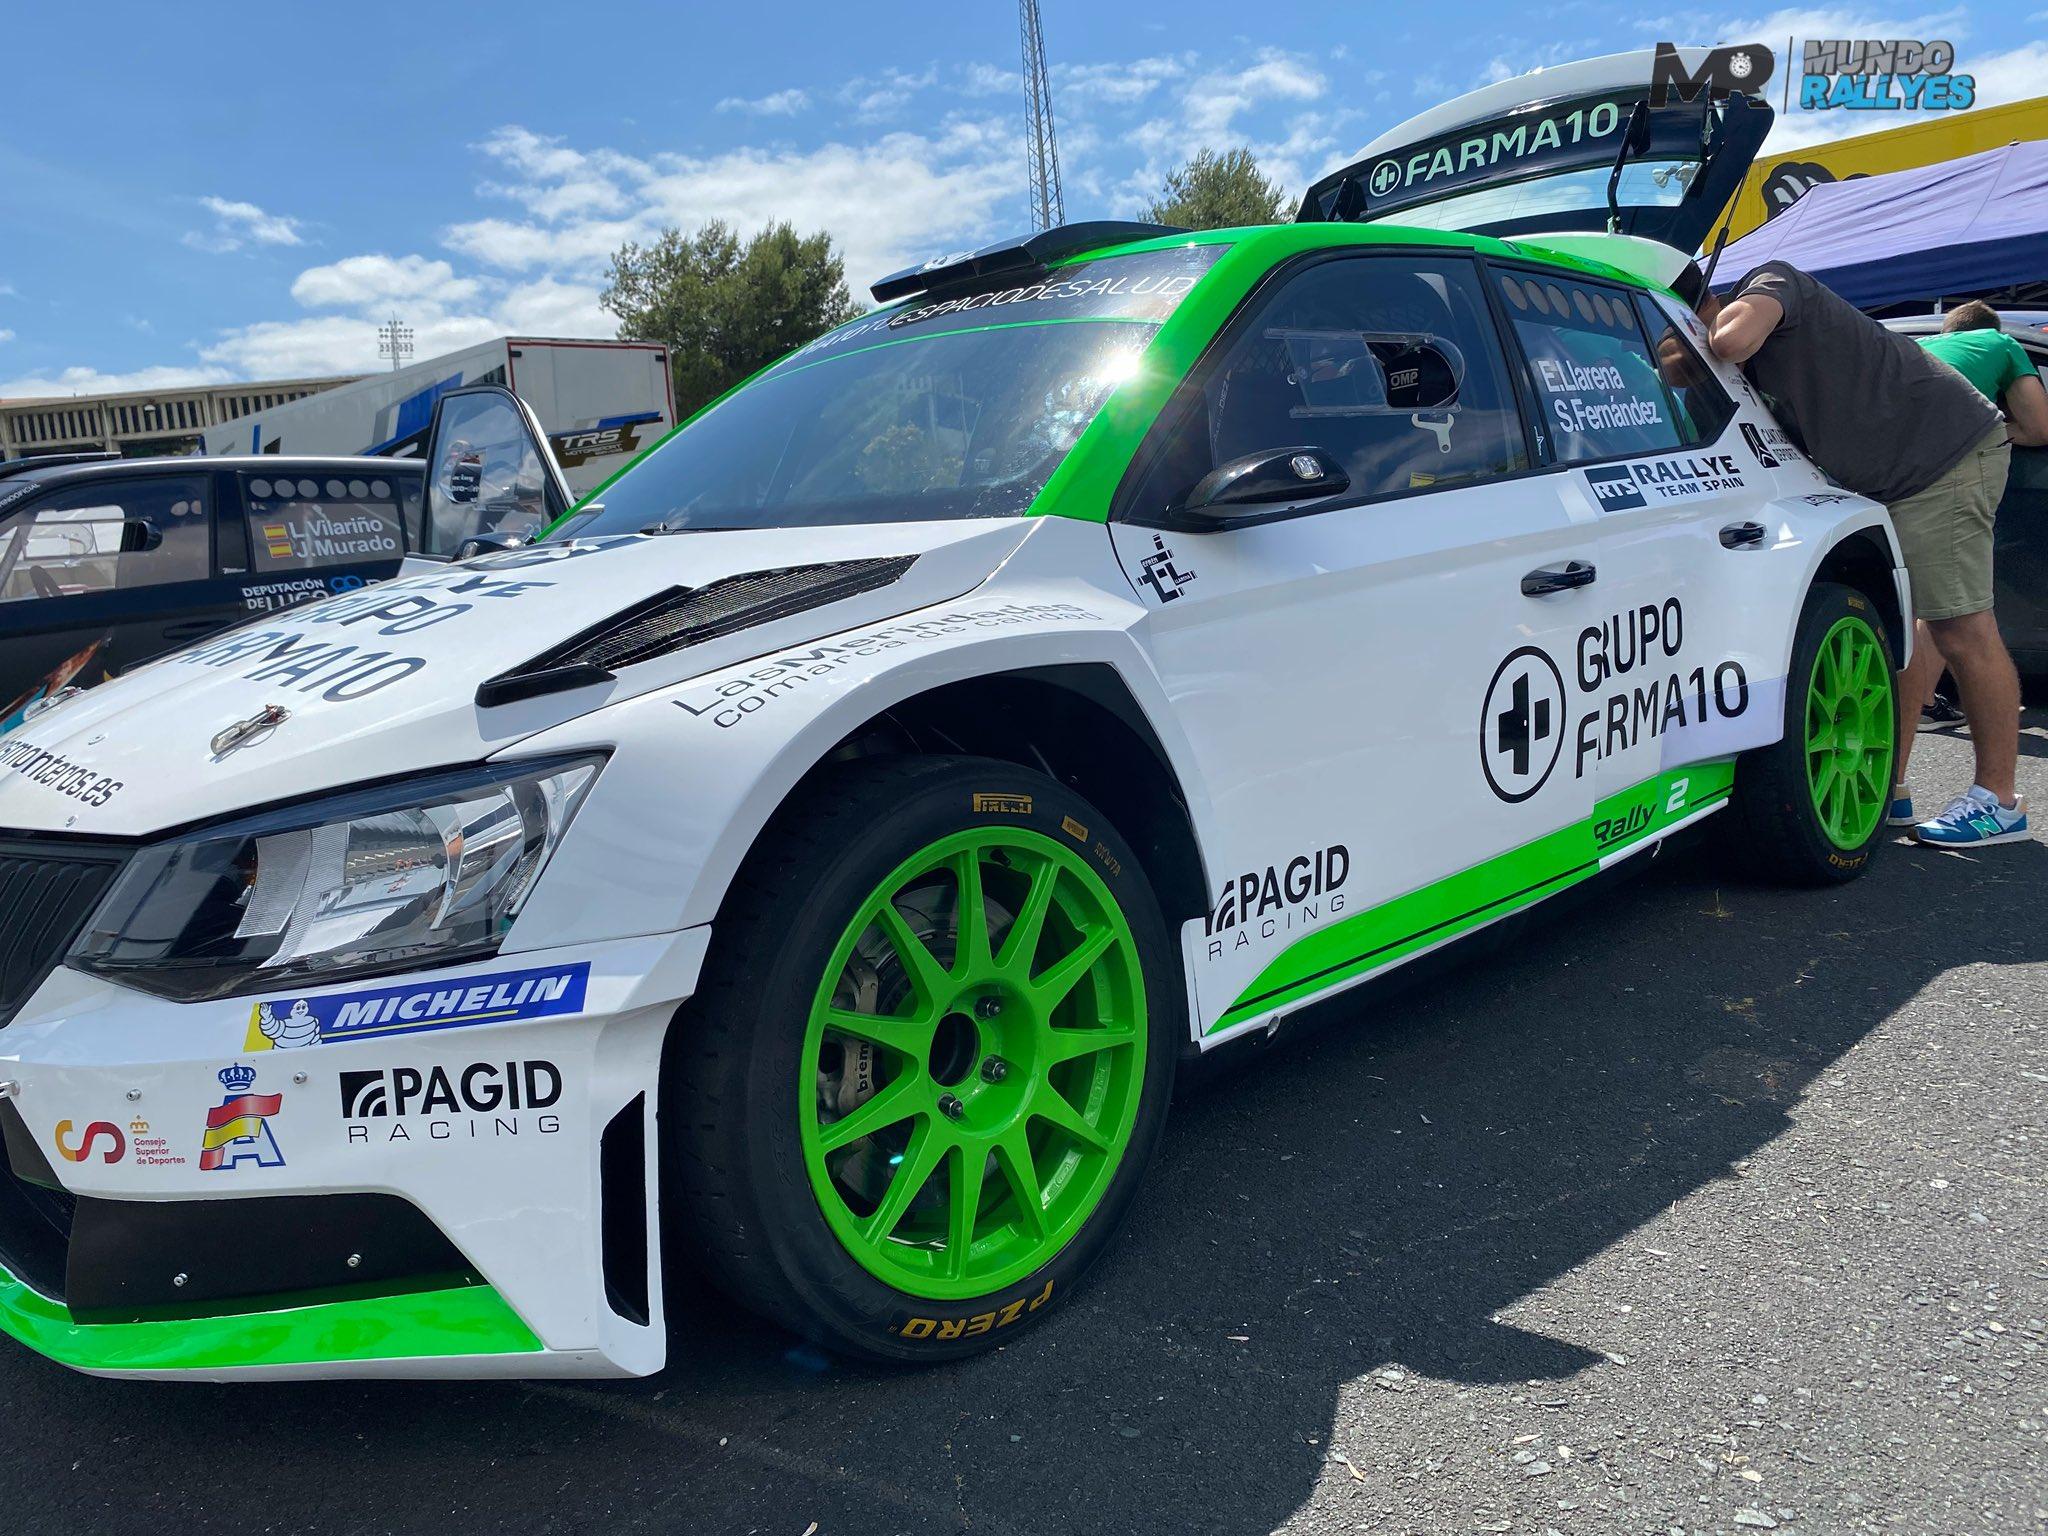 SCER + TER: 52º Rallye de Ferrol - Suzuki [20-21 Agosto] E9J4HvmXMAg65GQ?format=jpg&name=large